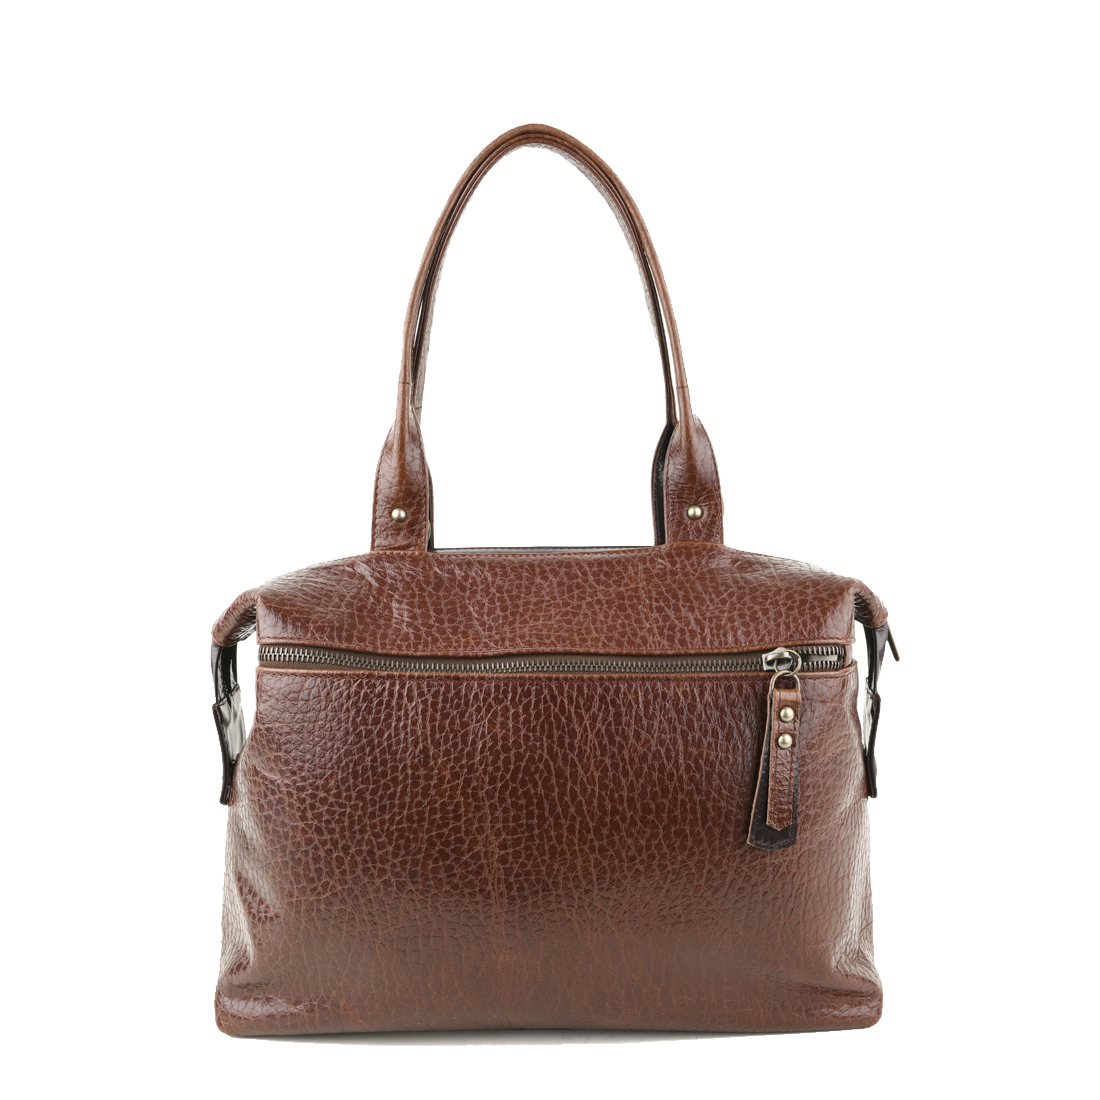 Grace Dark Brown Leather Tote Bag